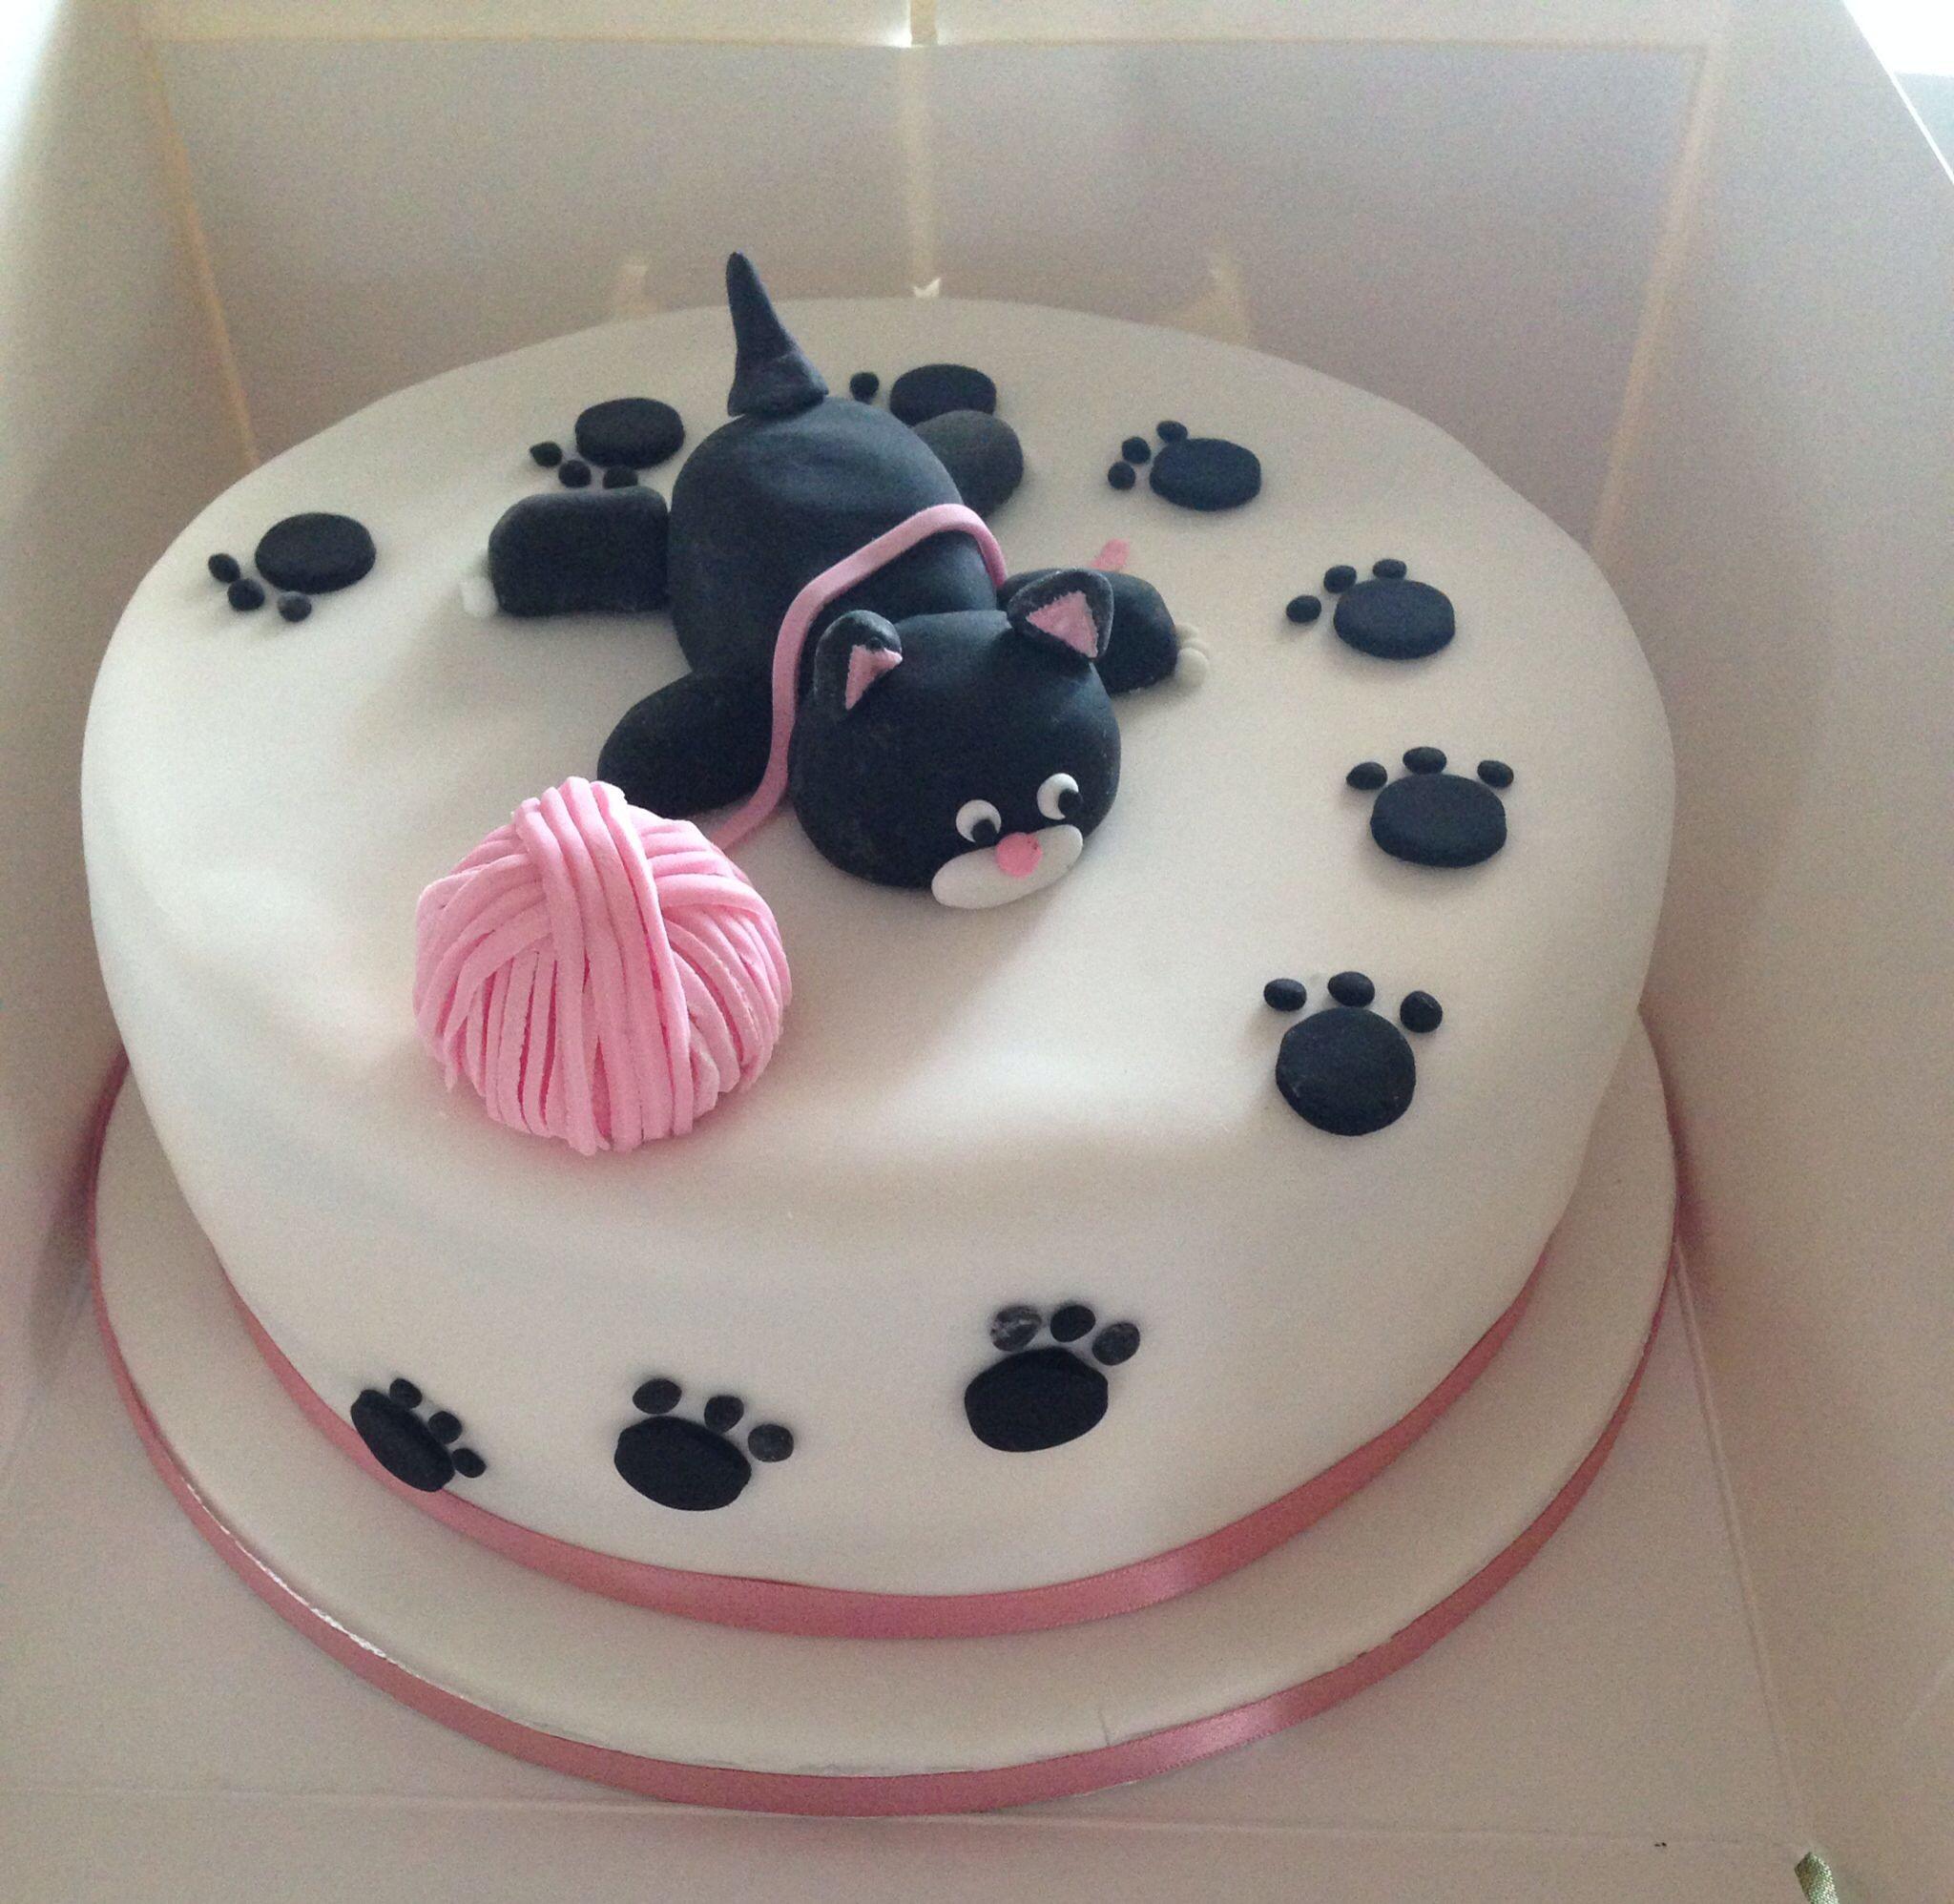 Cat Birthday Cake  Belated Cat Birthday Cake Σχέδια για τούρτες